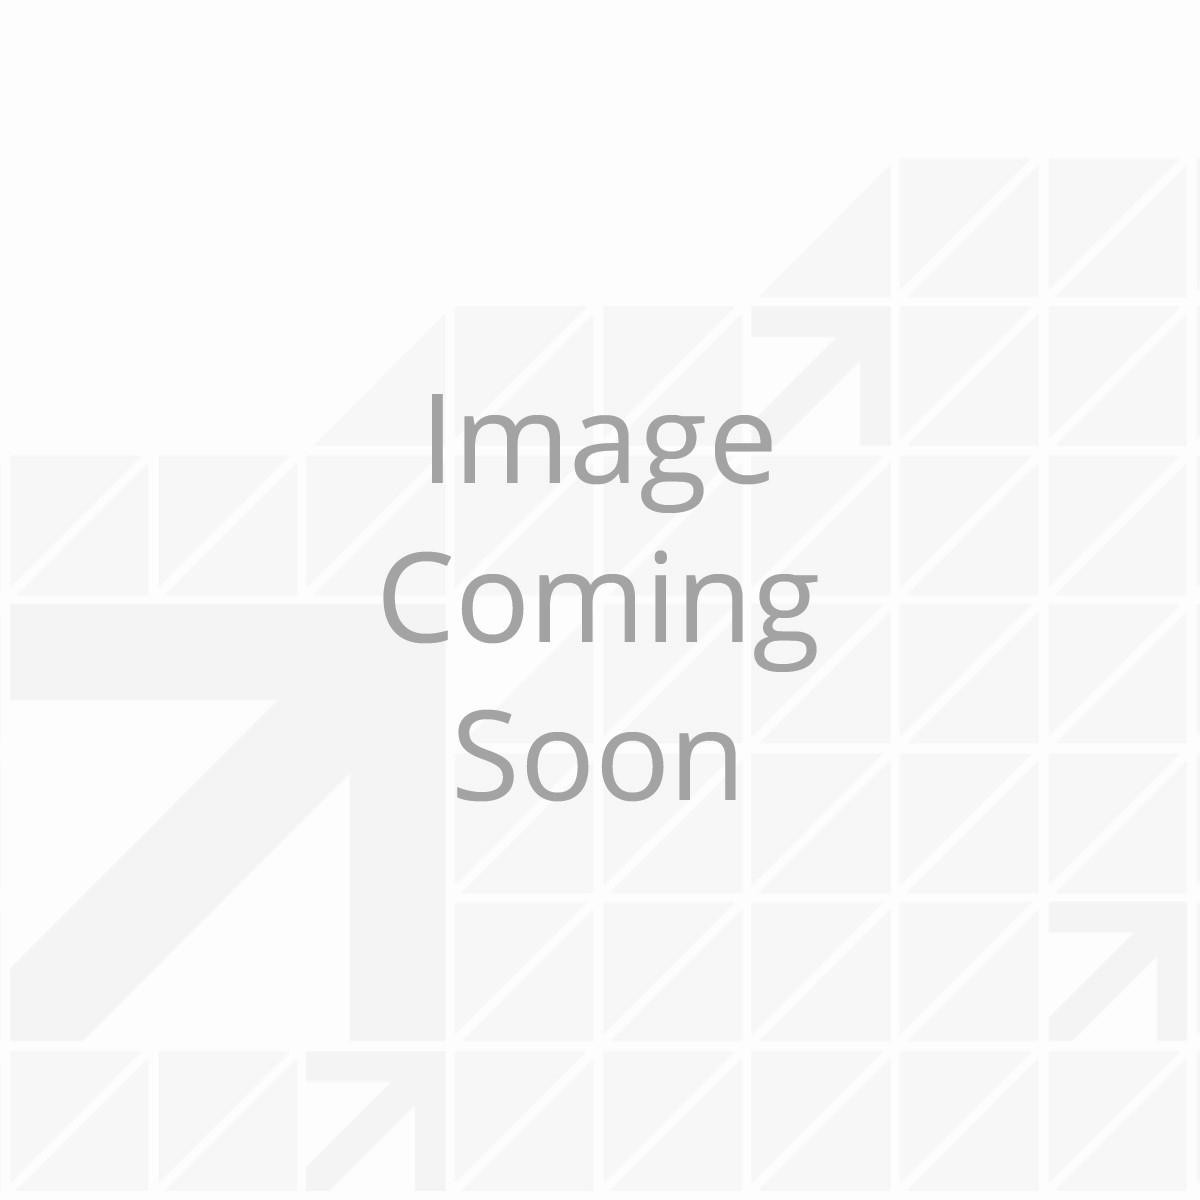 21' Power & Hybrid Awning Roller Assembly - Prepflex Blue Fade